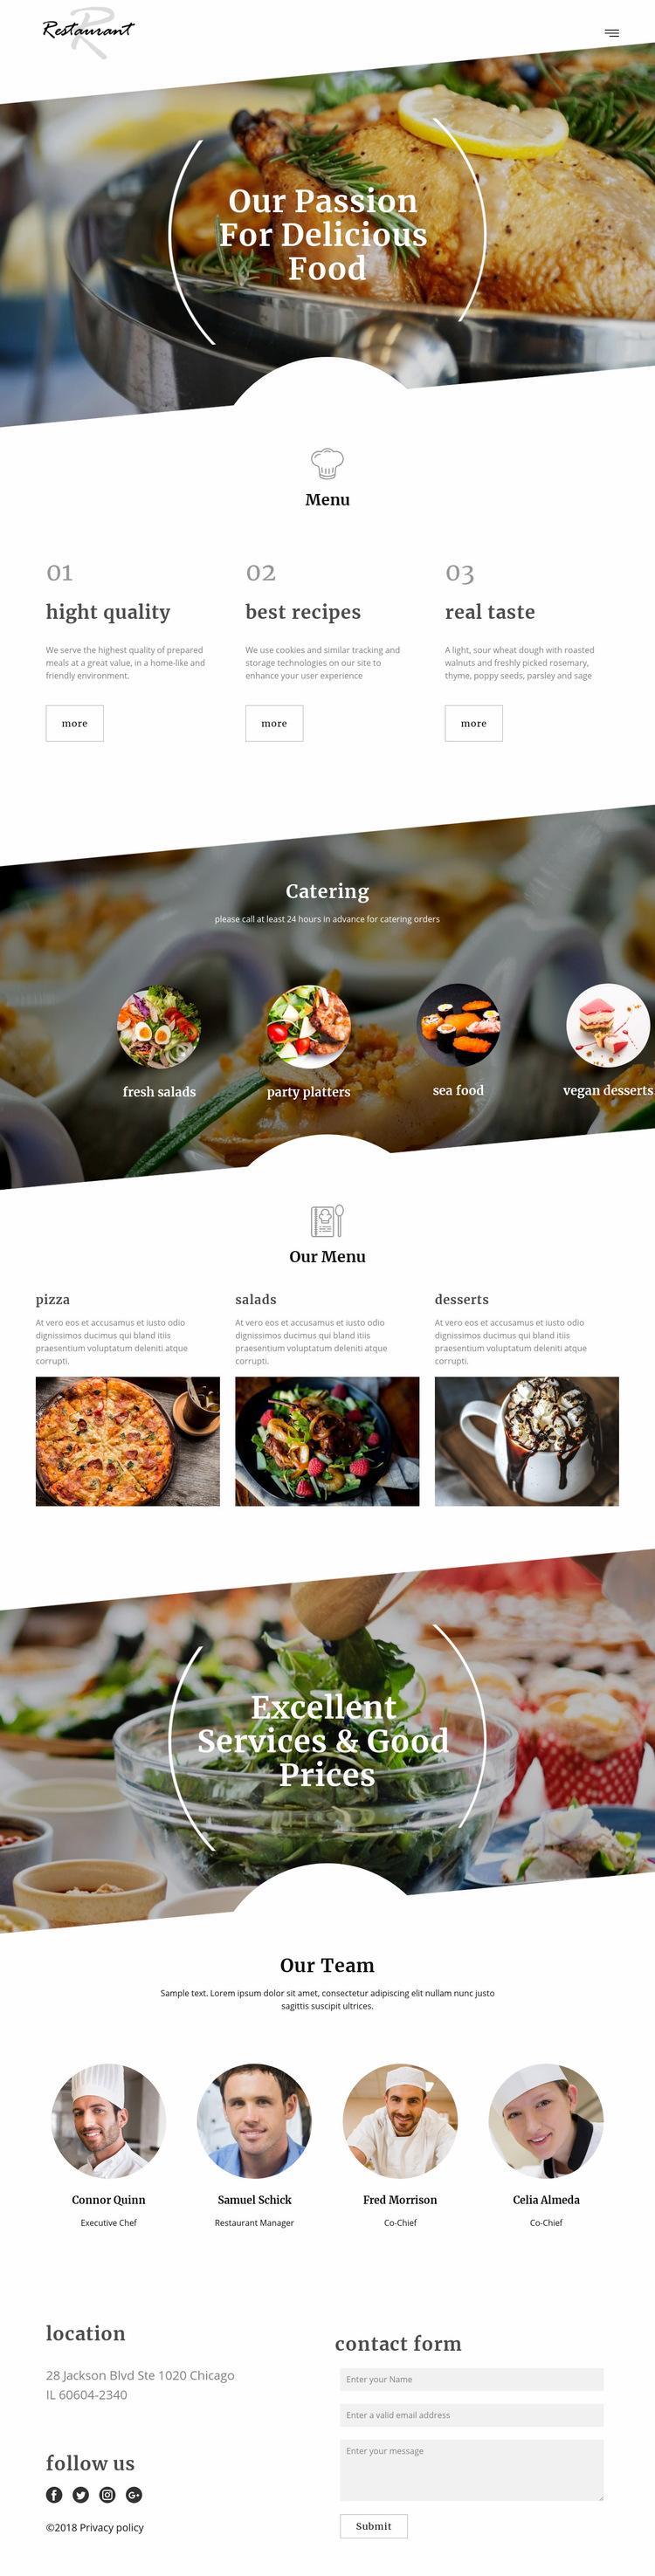 Executive chef recipes Web Page Design